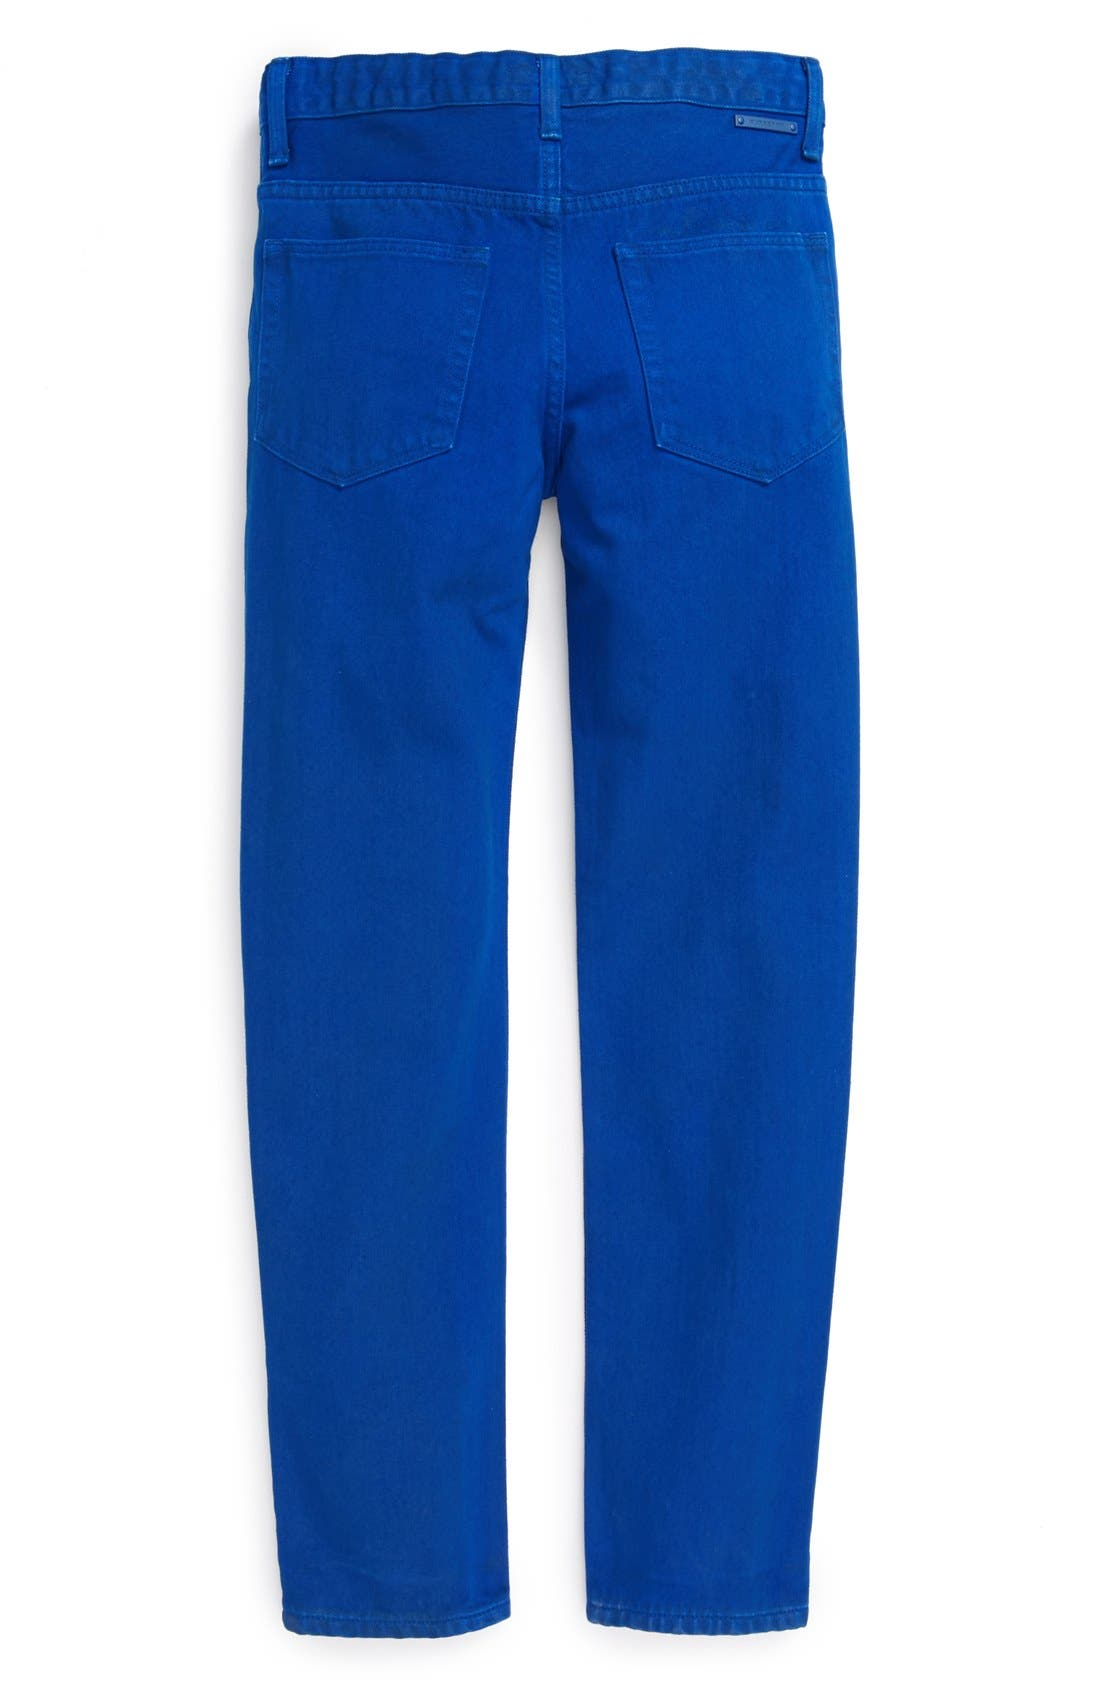 Alternate Image 1 Selected - Burberry 'Mini Shoreditch' Skinny Jeans (Little Boys & Big Boys)